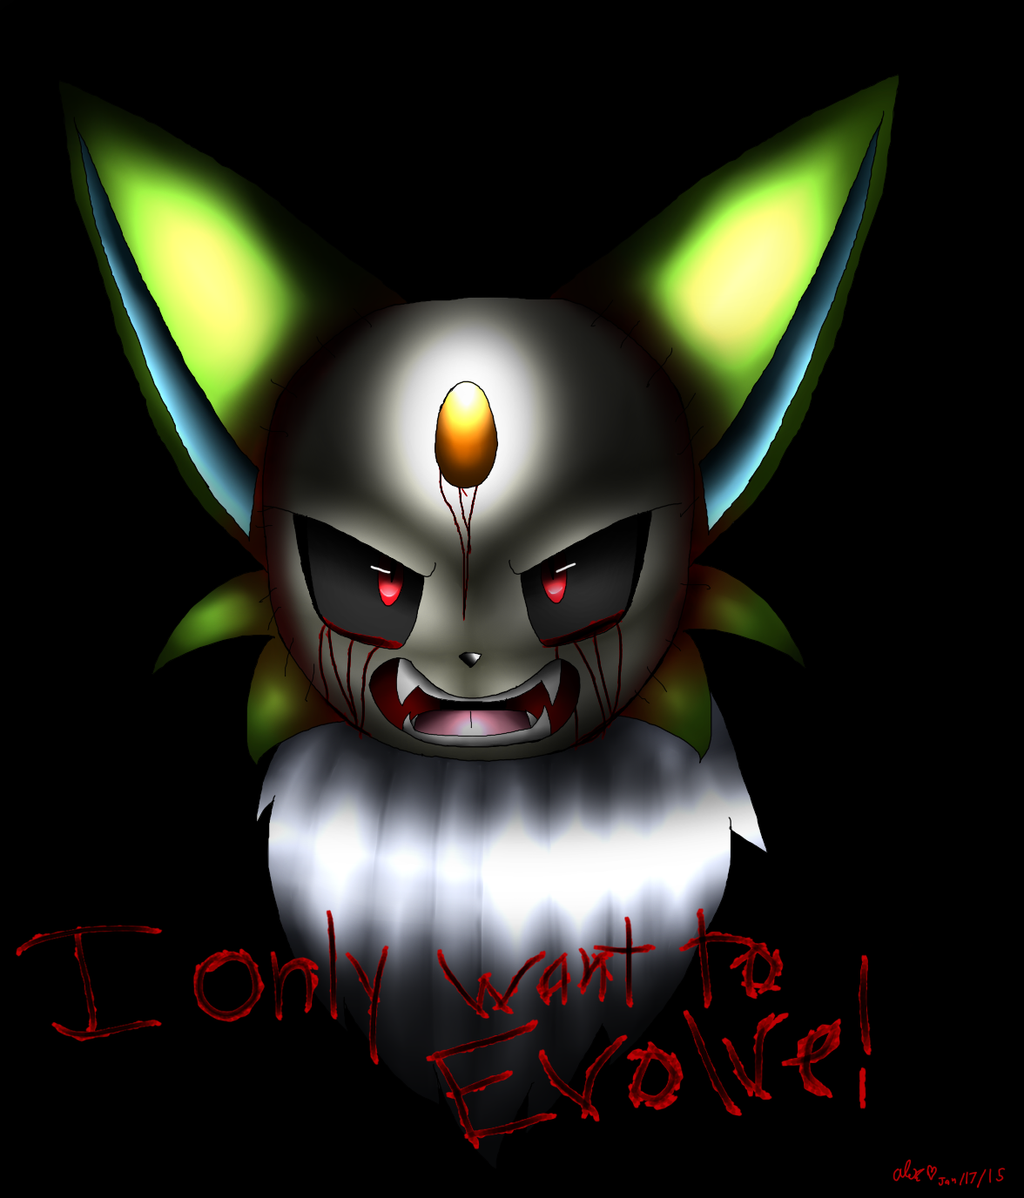 eeeee pokemon images pokemon images